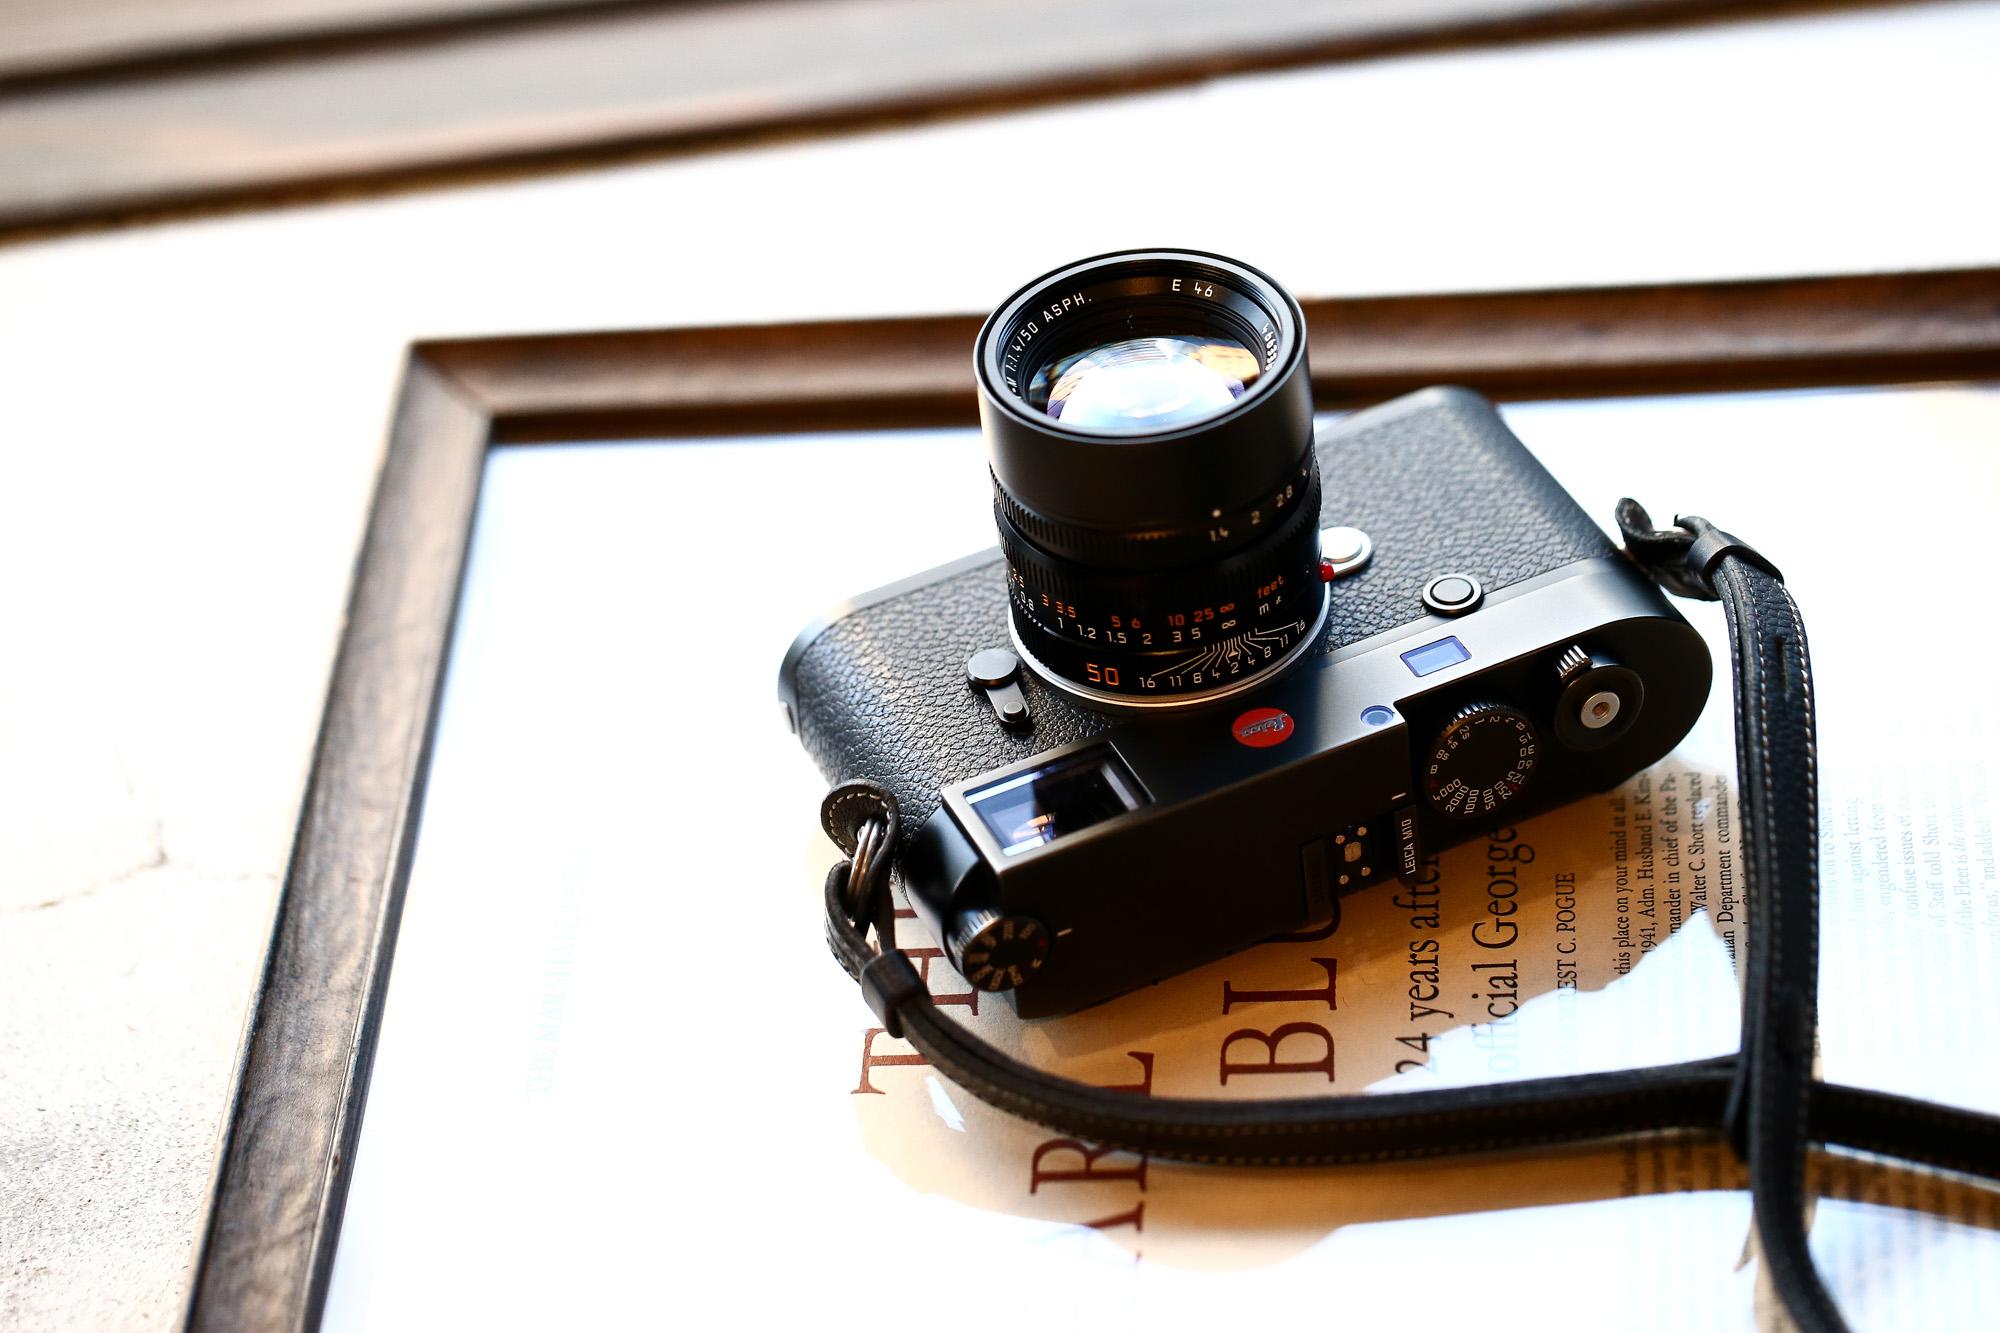 LEICA M10 + SUMMILUX-M f1.4/50mm ASPH. ライカM10 ズミルックス 愛知 名古屋 alto e diritto アルトエデリット 標準レンズ ライカ ズミル